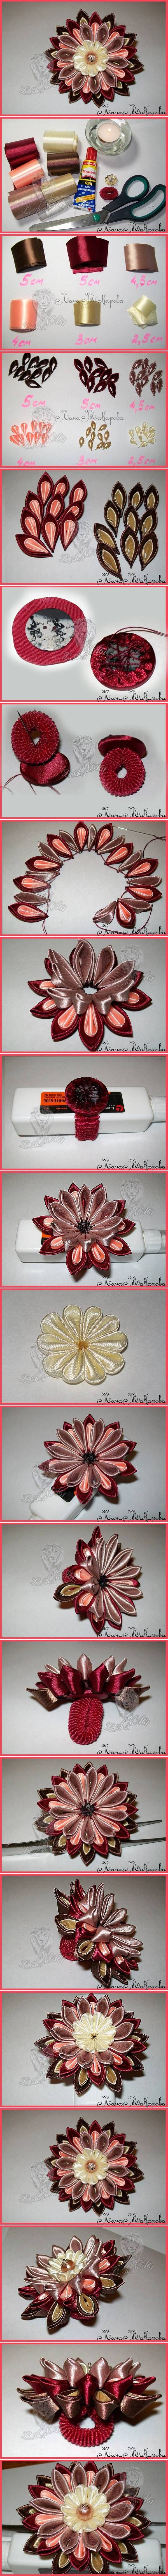 52 best ribbon flowers images on Pinterest